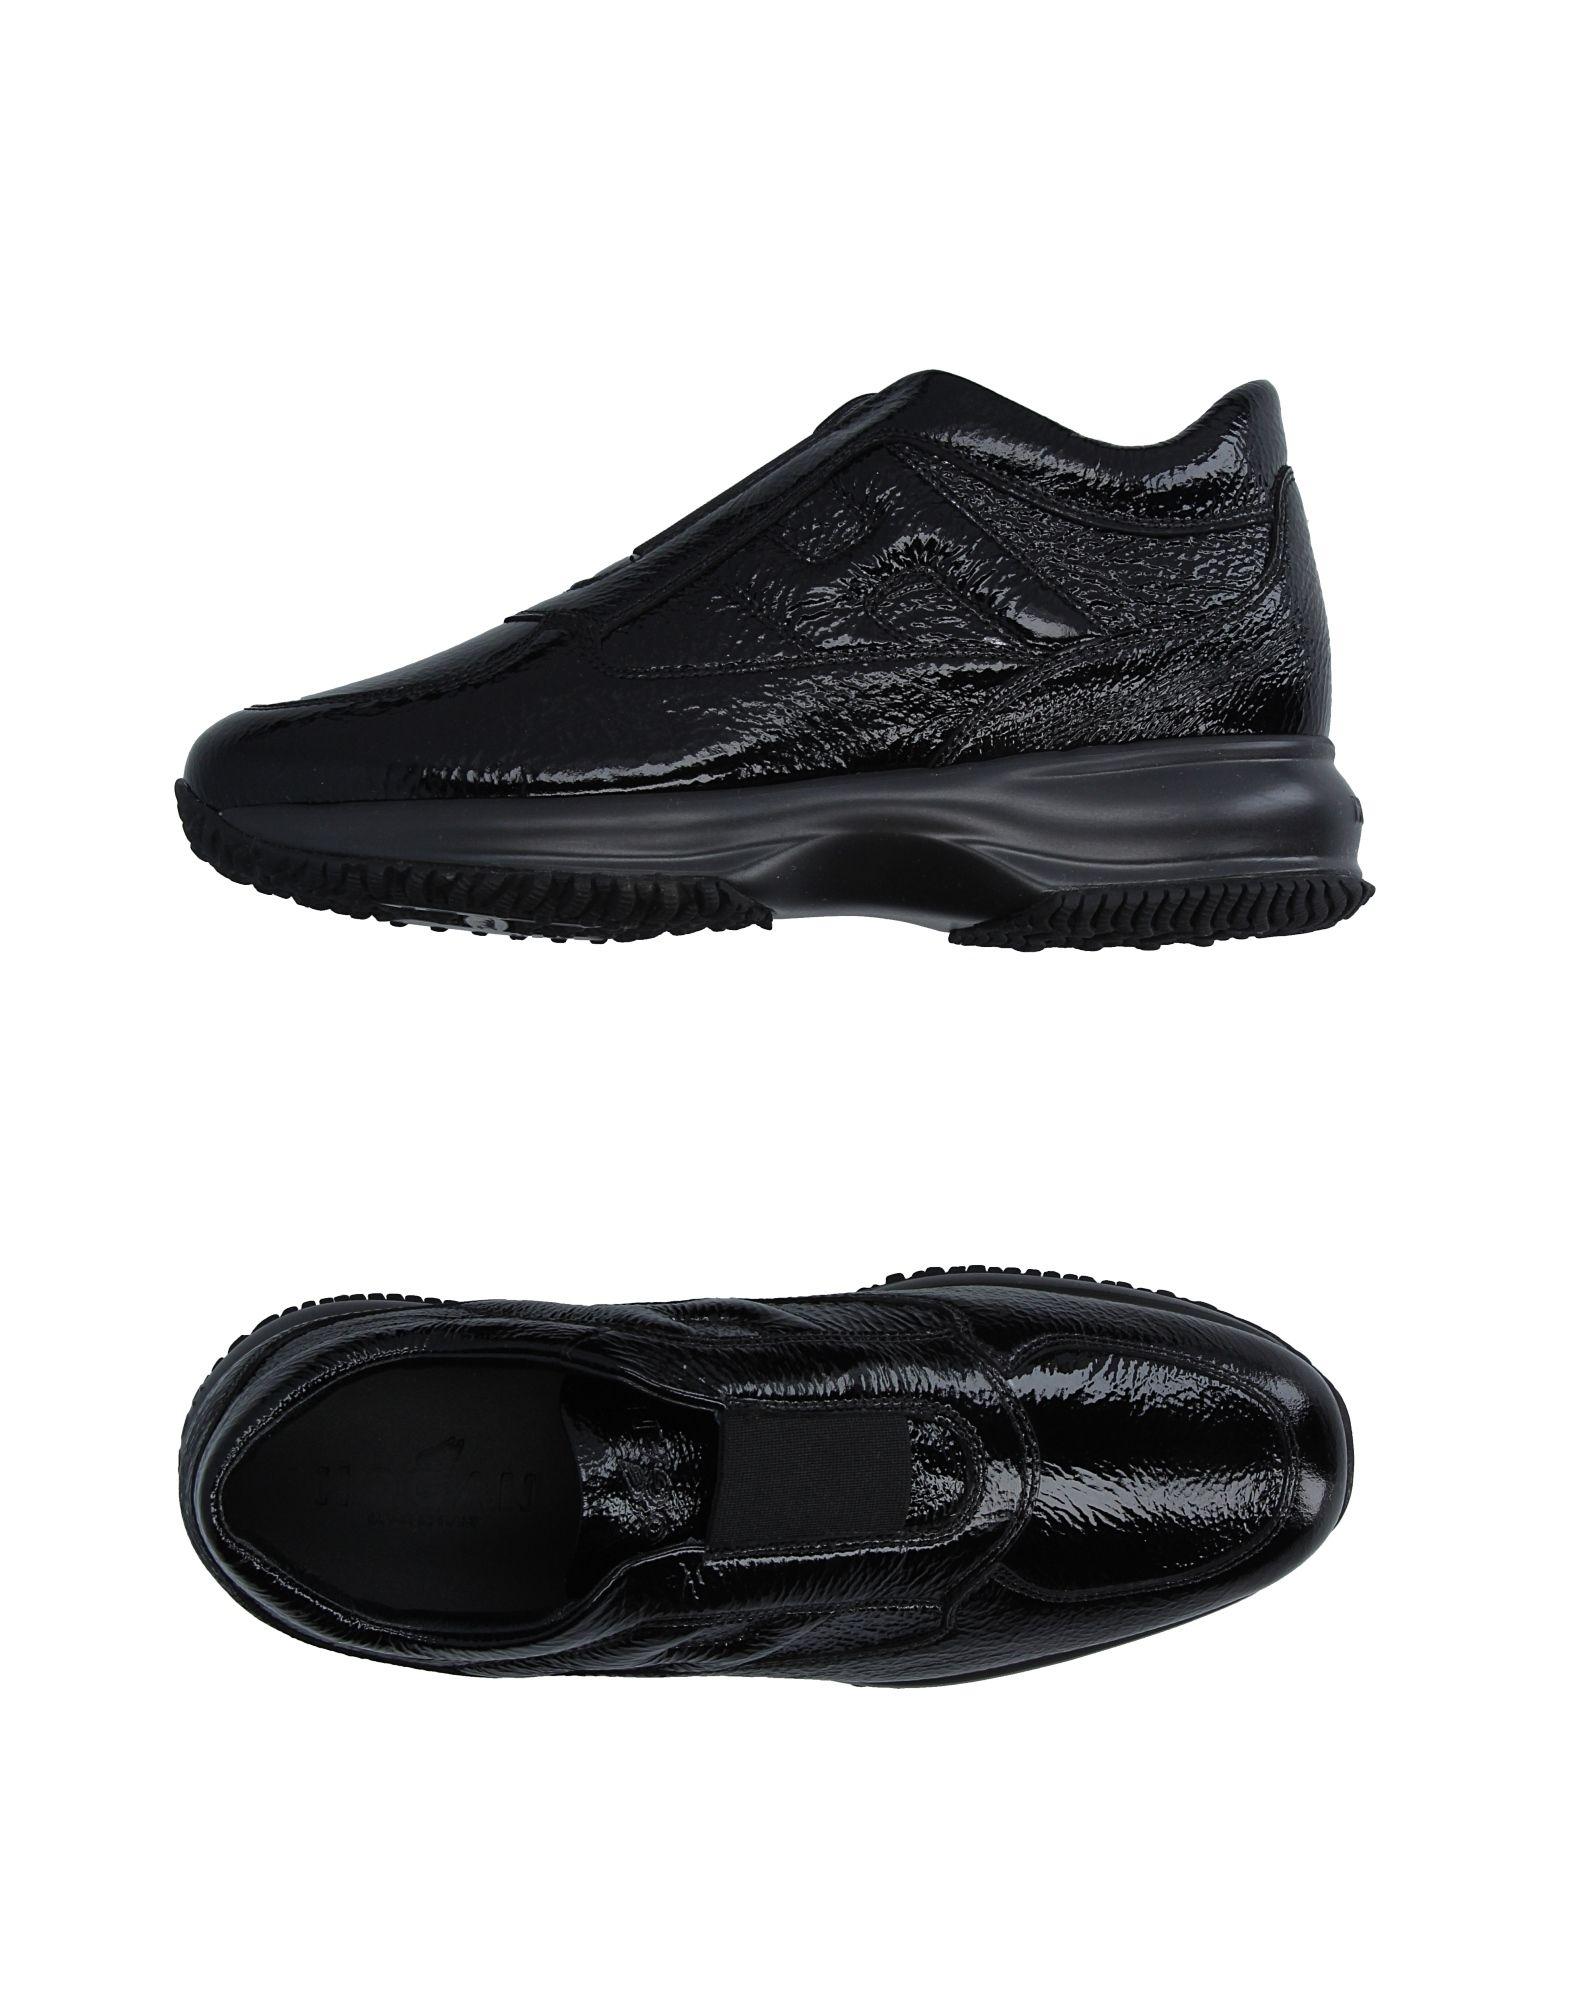 Hogan Sneakers Damen  11299202JWGut aussehende strapazierfähige Schuhe